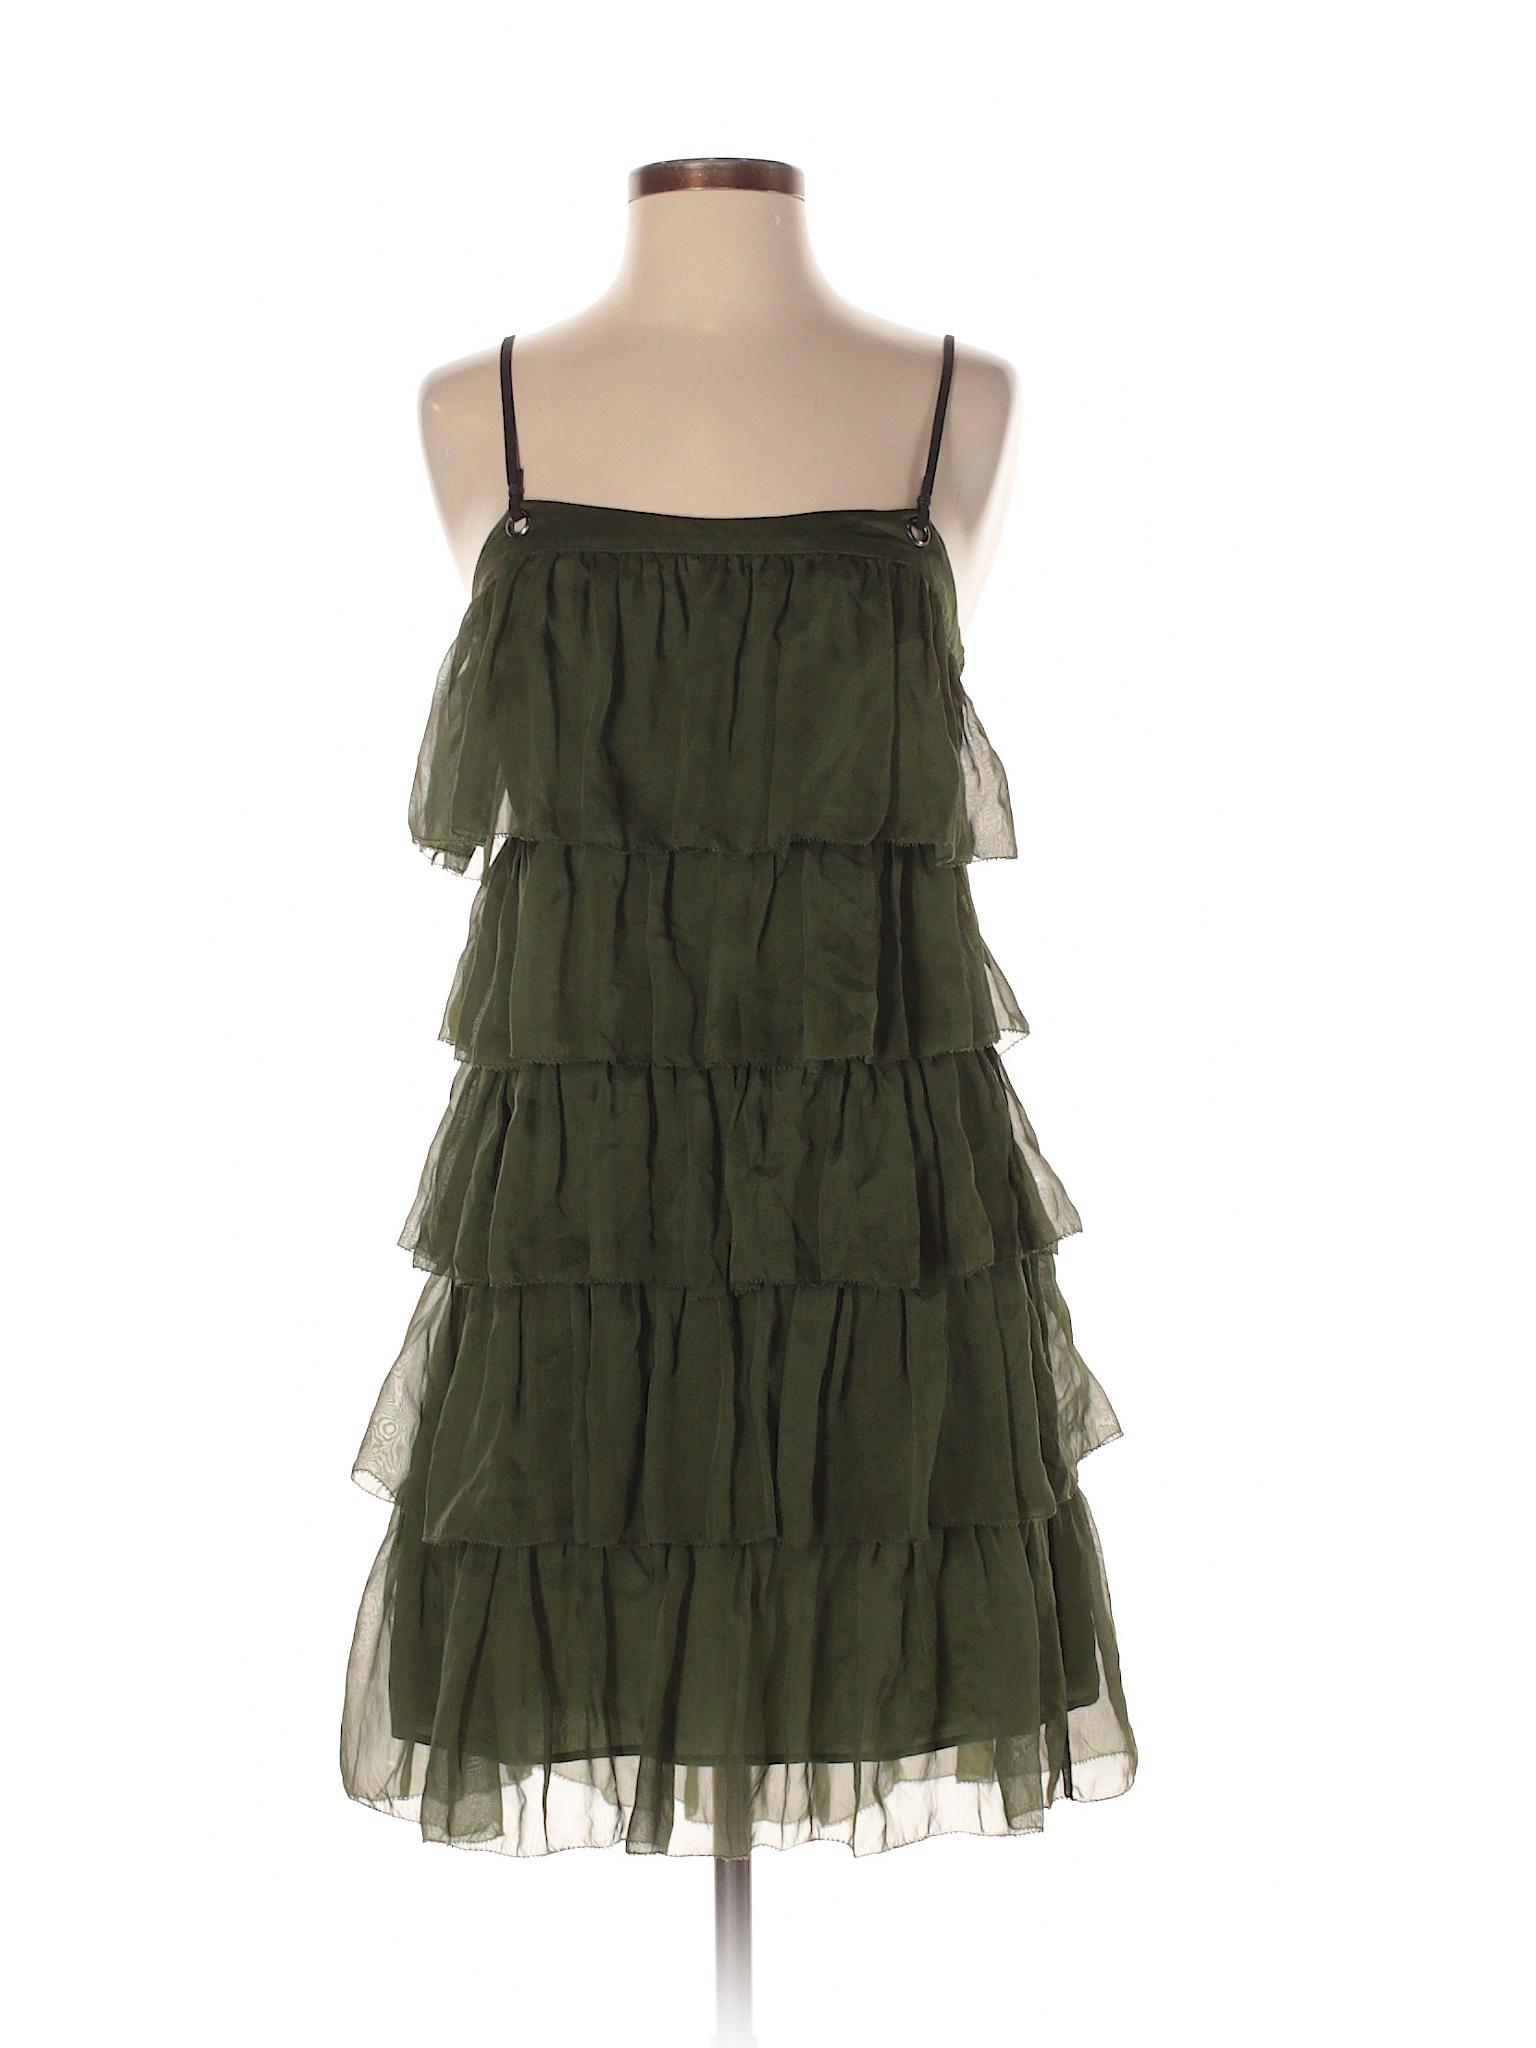 Dress Malandrino winter Casual Boutique Catherine APnZIR1q